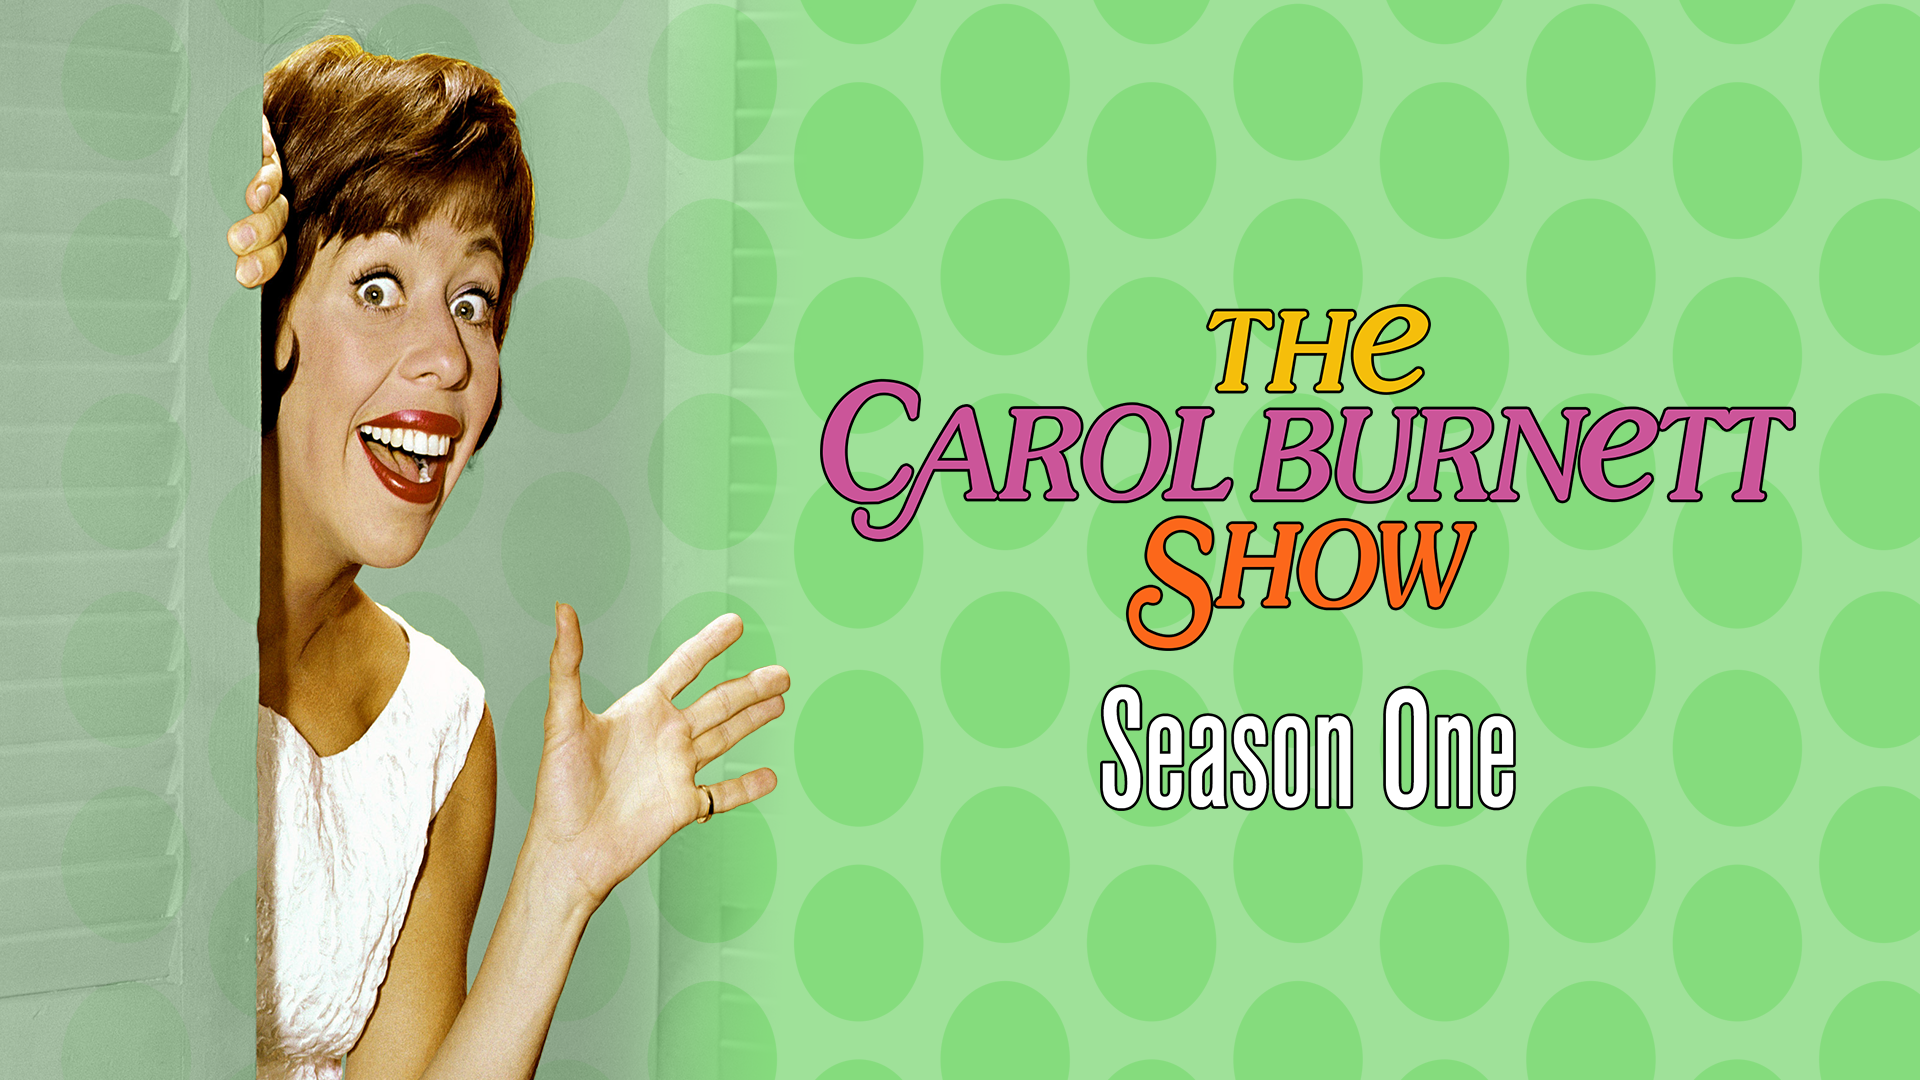 The Carol Burnett Show: Season One